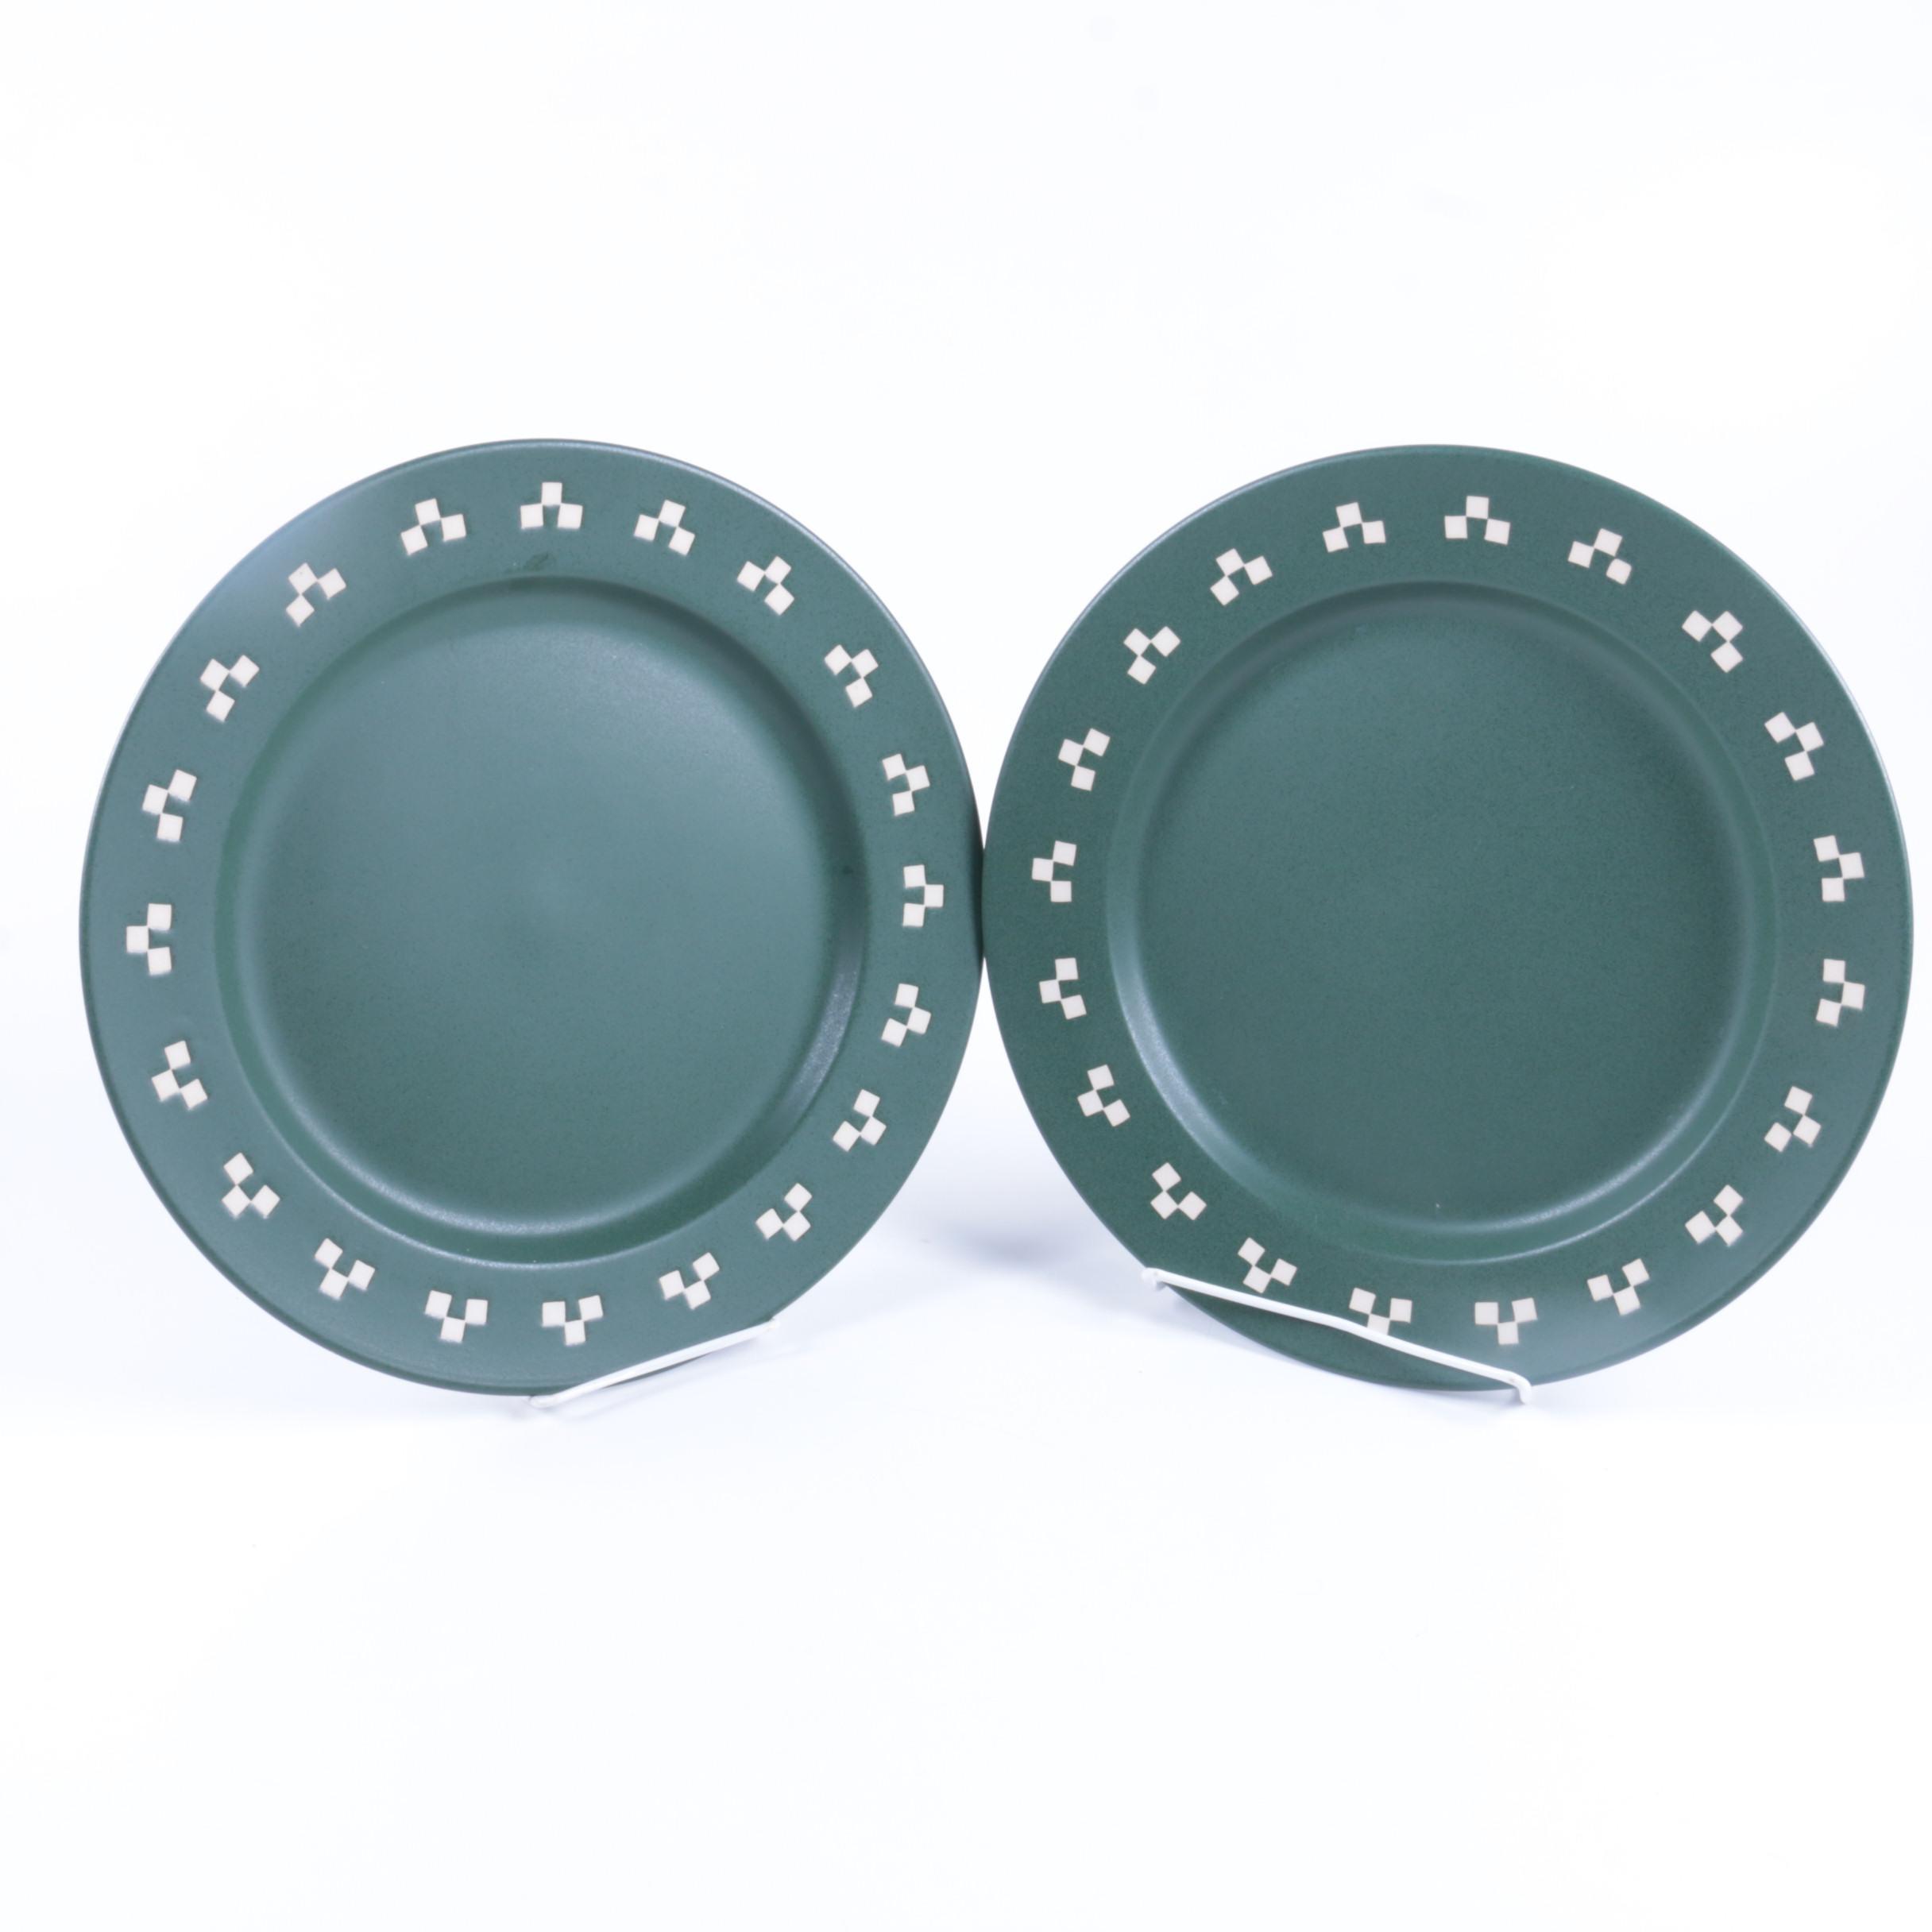 """Green Checks"" Plates"